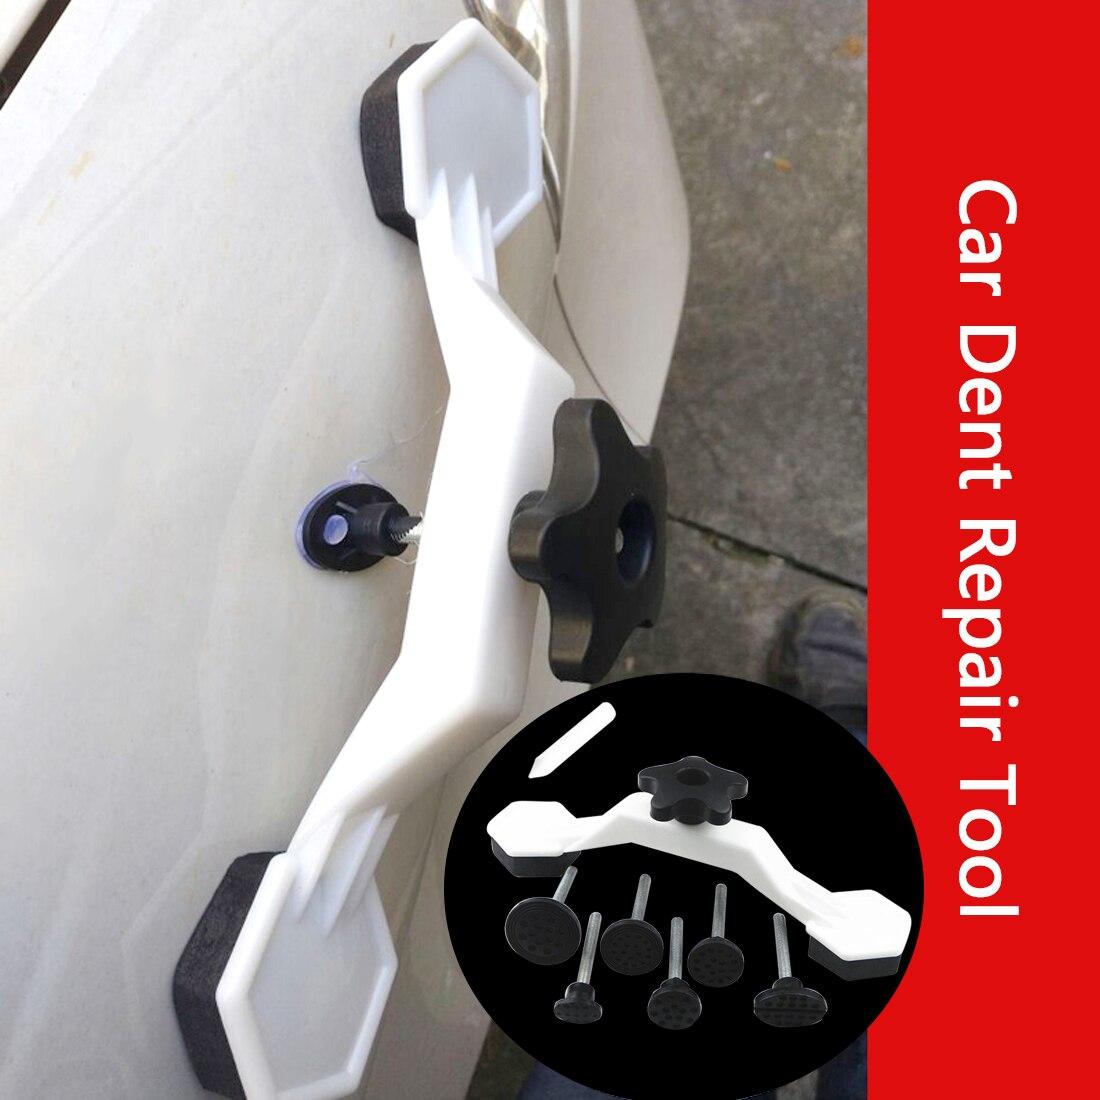 Fix Dent Repair Tool Kit 8pcs Instrument Paintless Auto Car Body Damage Pulling Bridge Removal Glue Tab Tool Hand Tool Set Newly